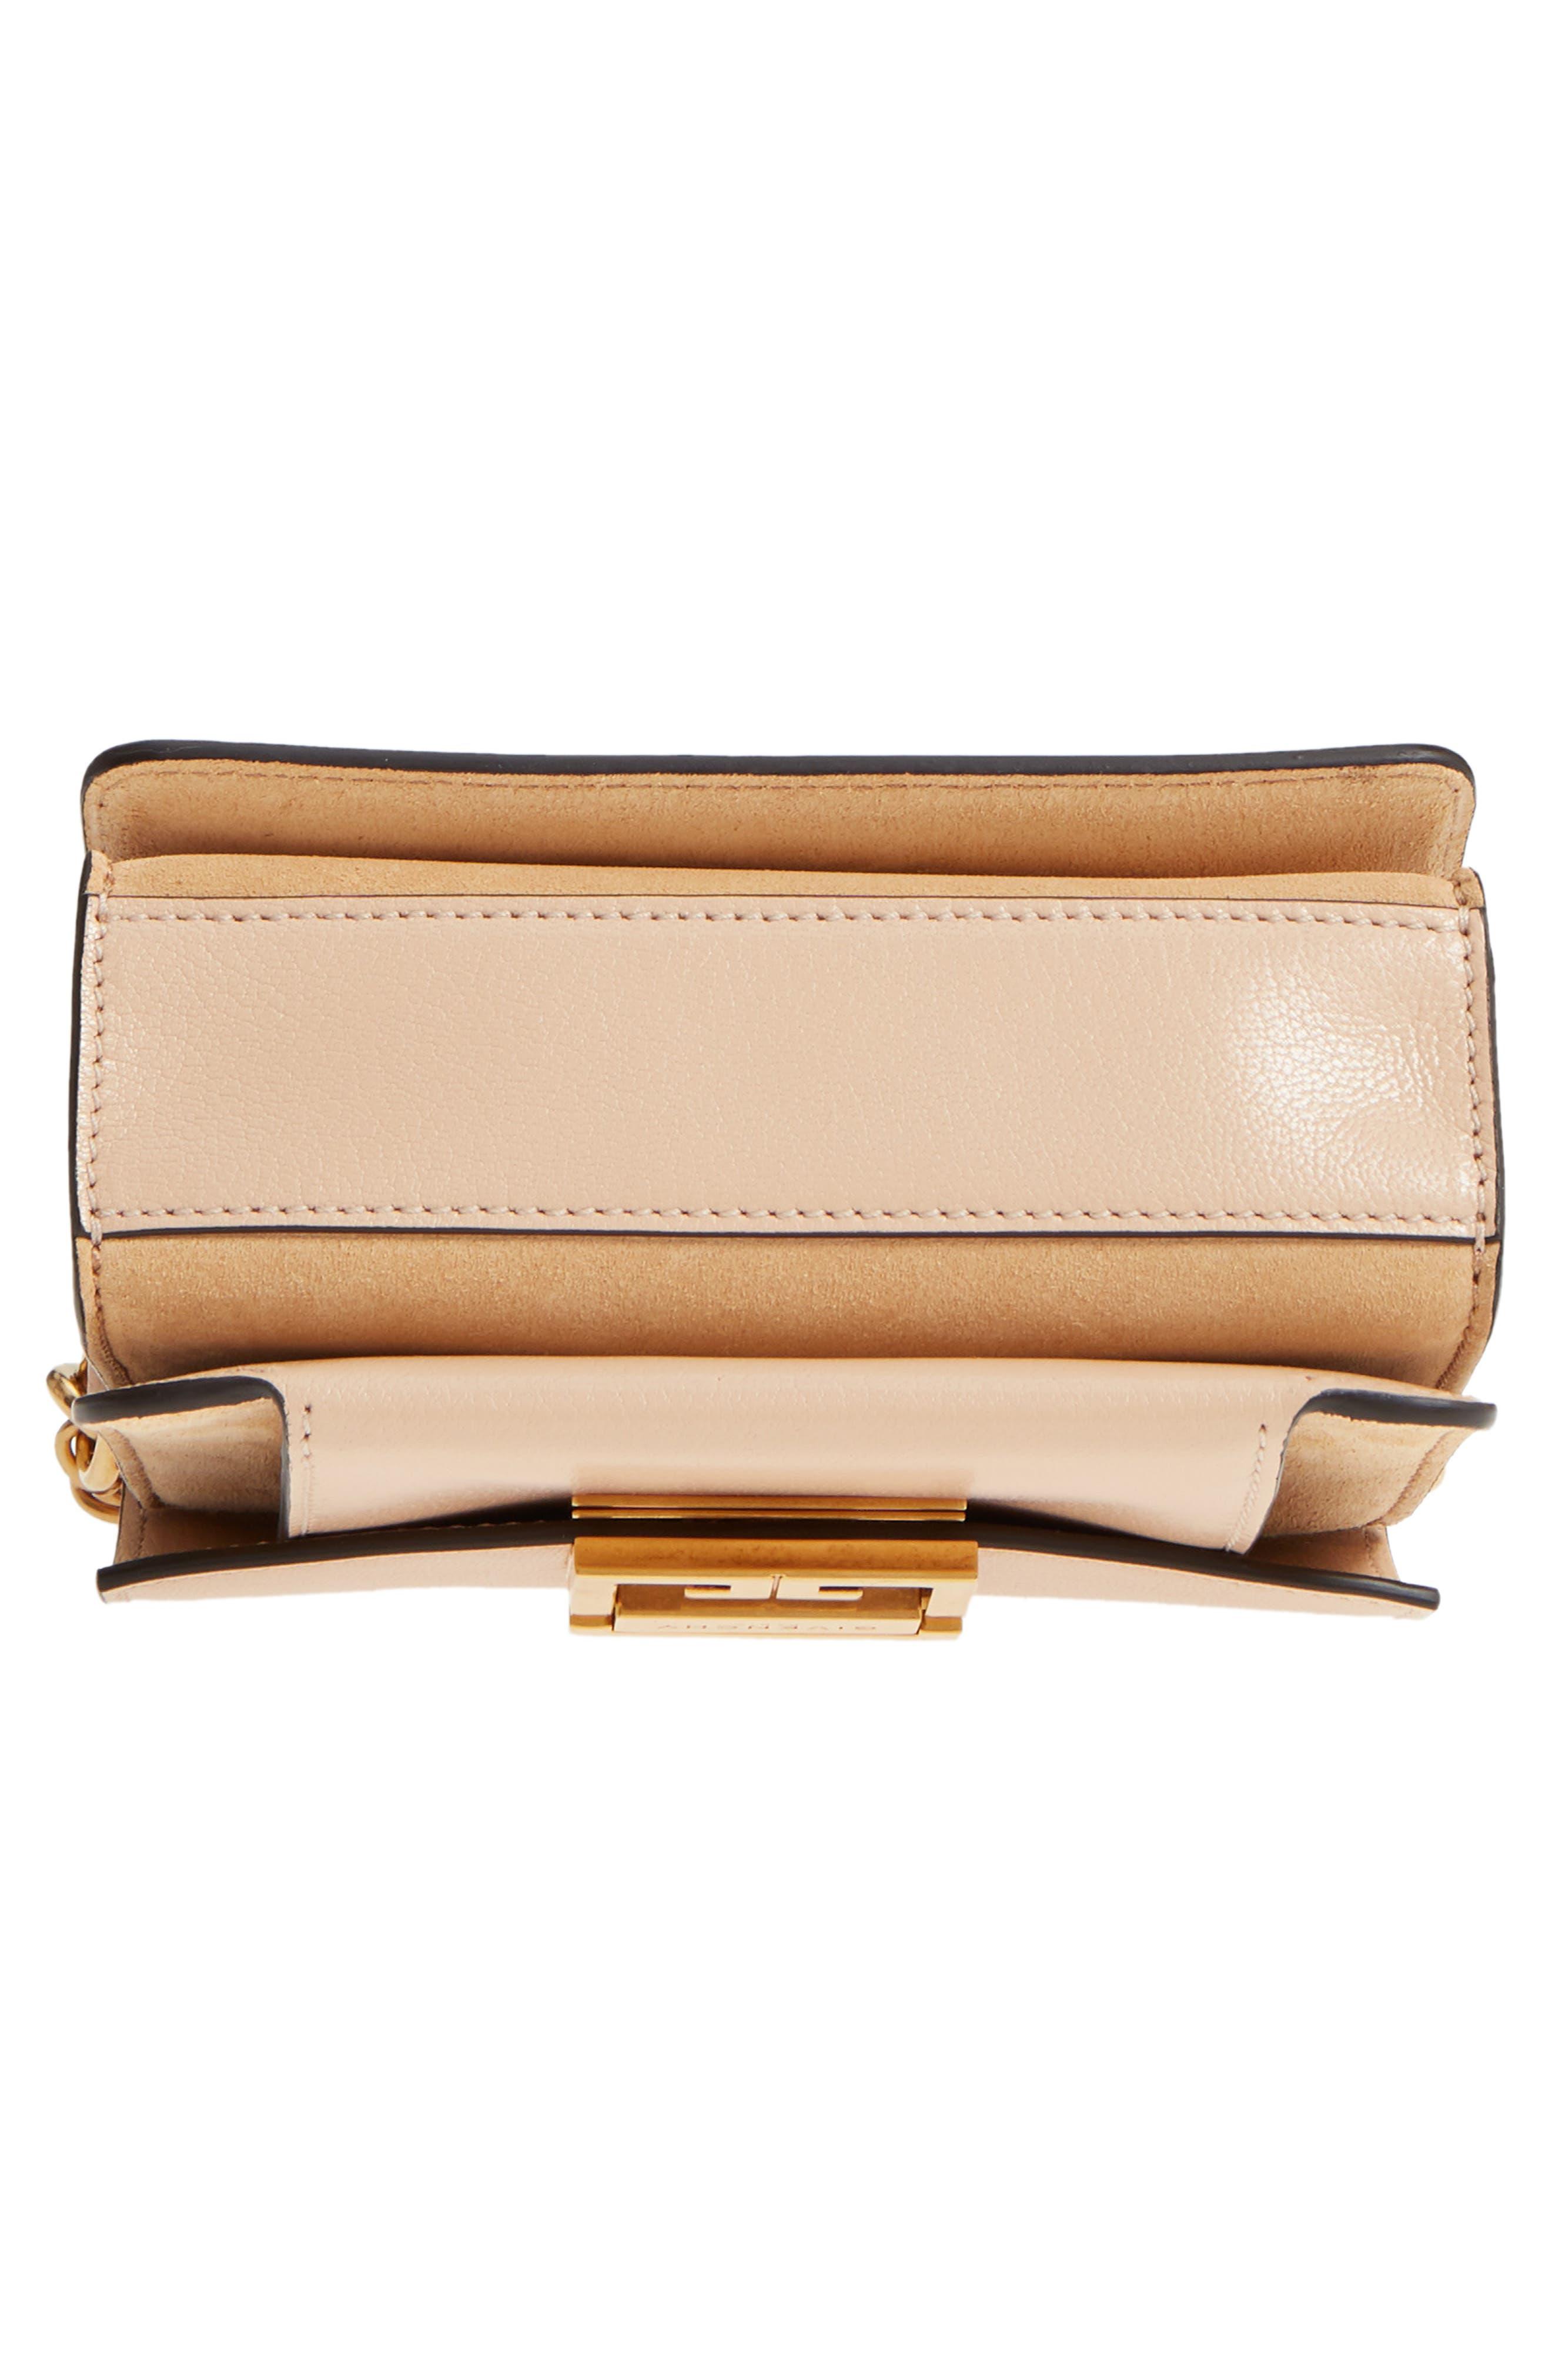 Mini GV3 Leather & Suede Crossbody Bag,                             Alternate thumbnail 5, color,                             Nude/ Light Beige